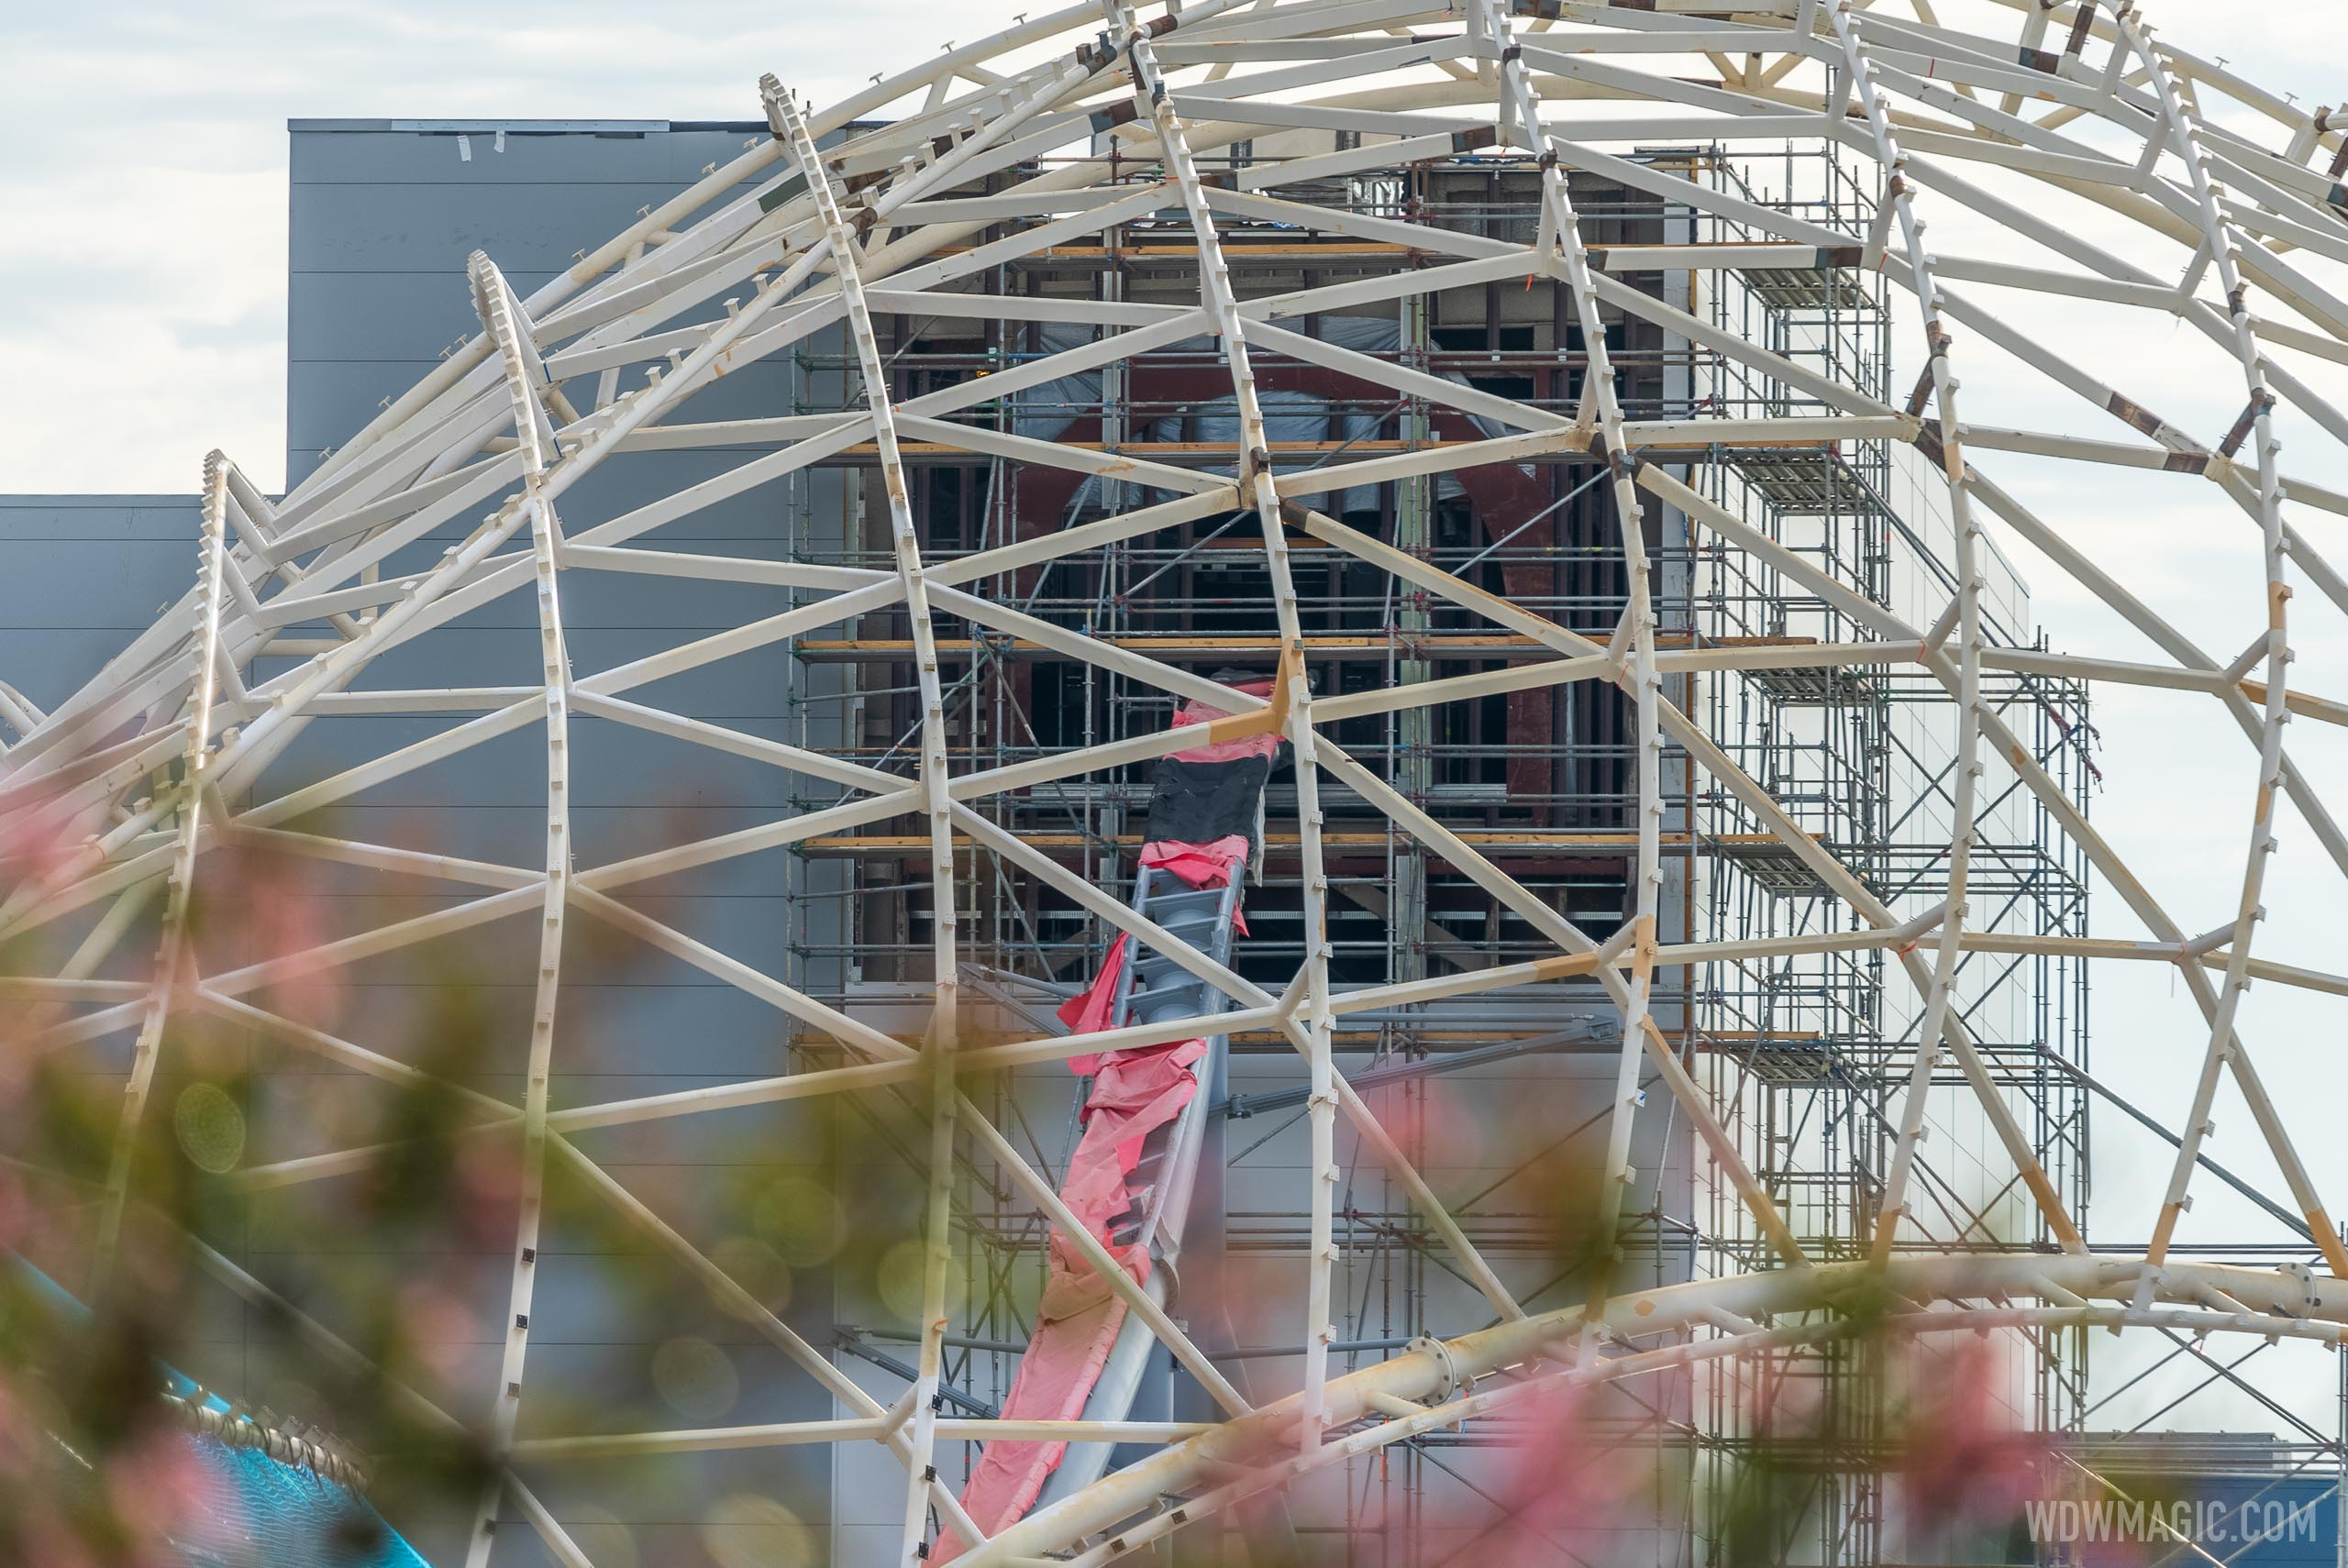 TRON Lightcycle Run construction at Walt Disney World